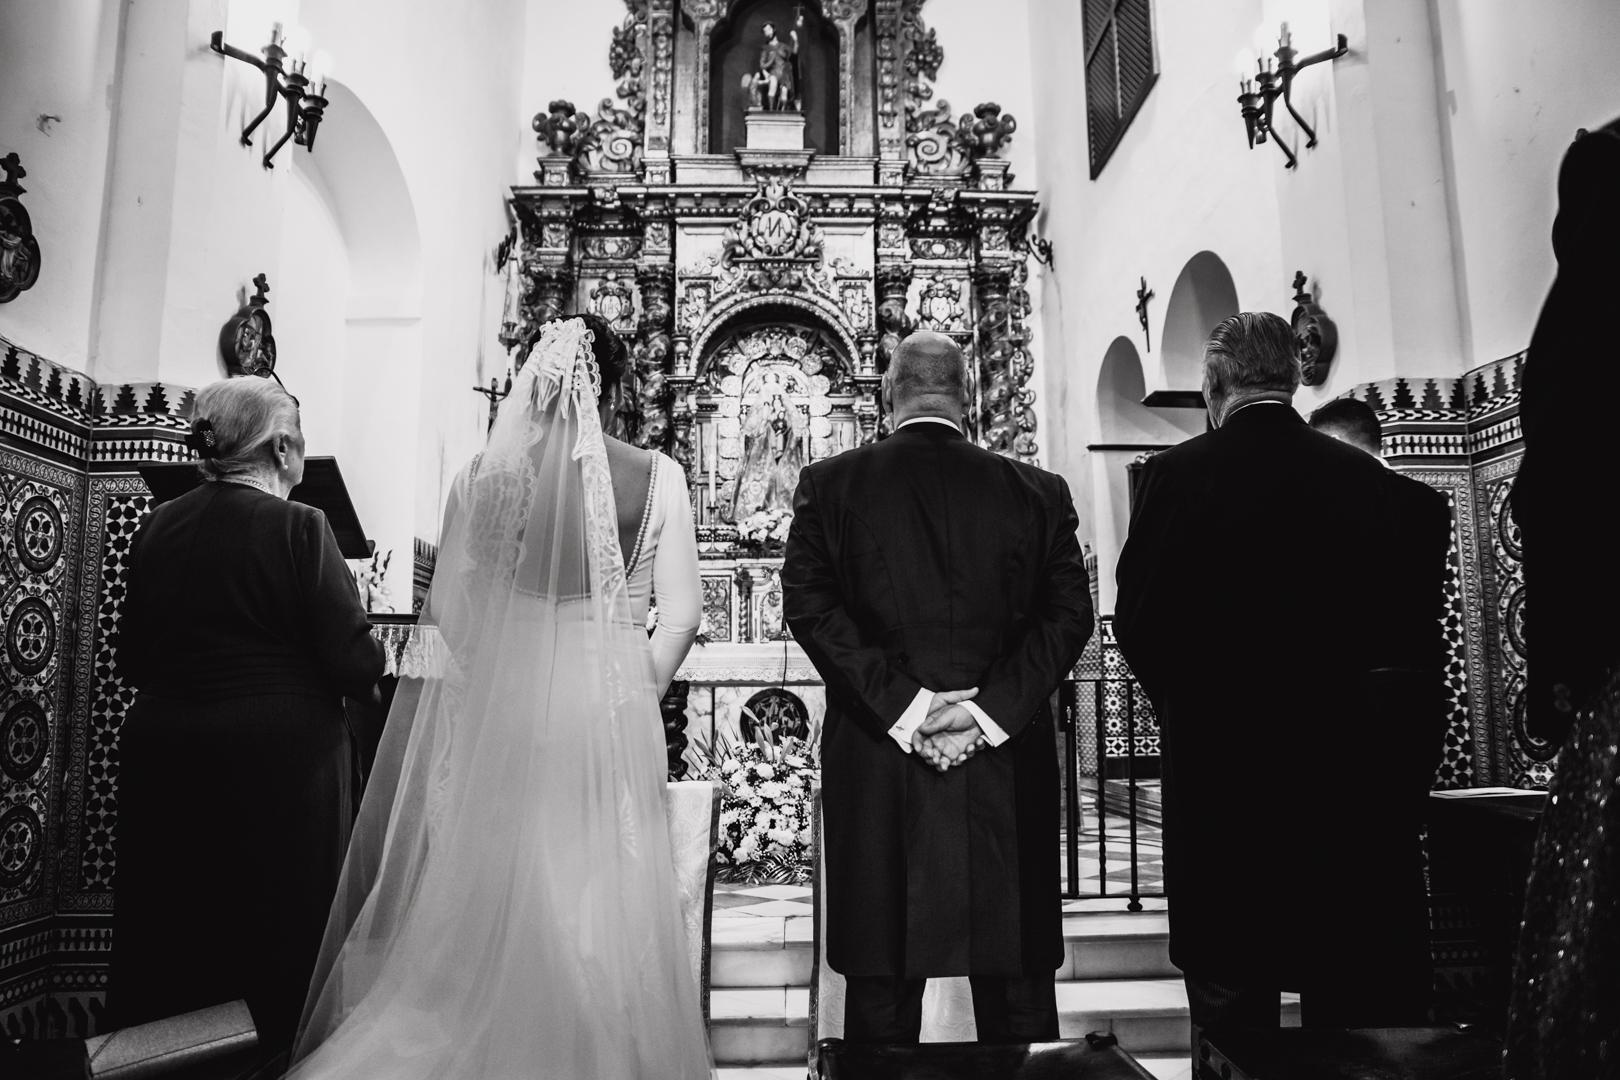 boda hacienda torre doña maria. carlos pavon fotografia. 600257783-78.jpg